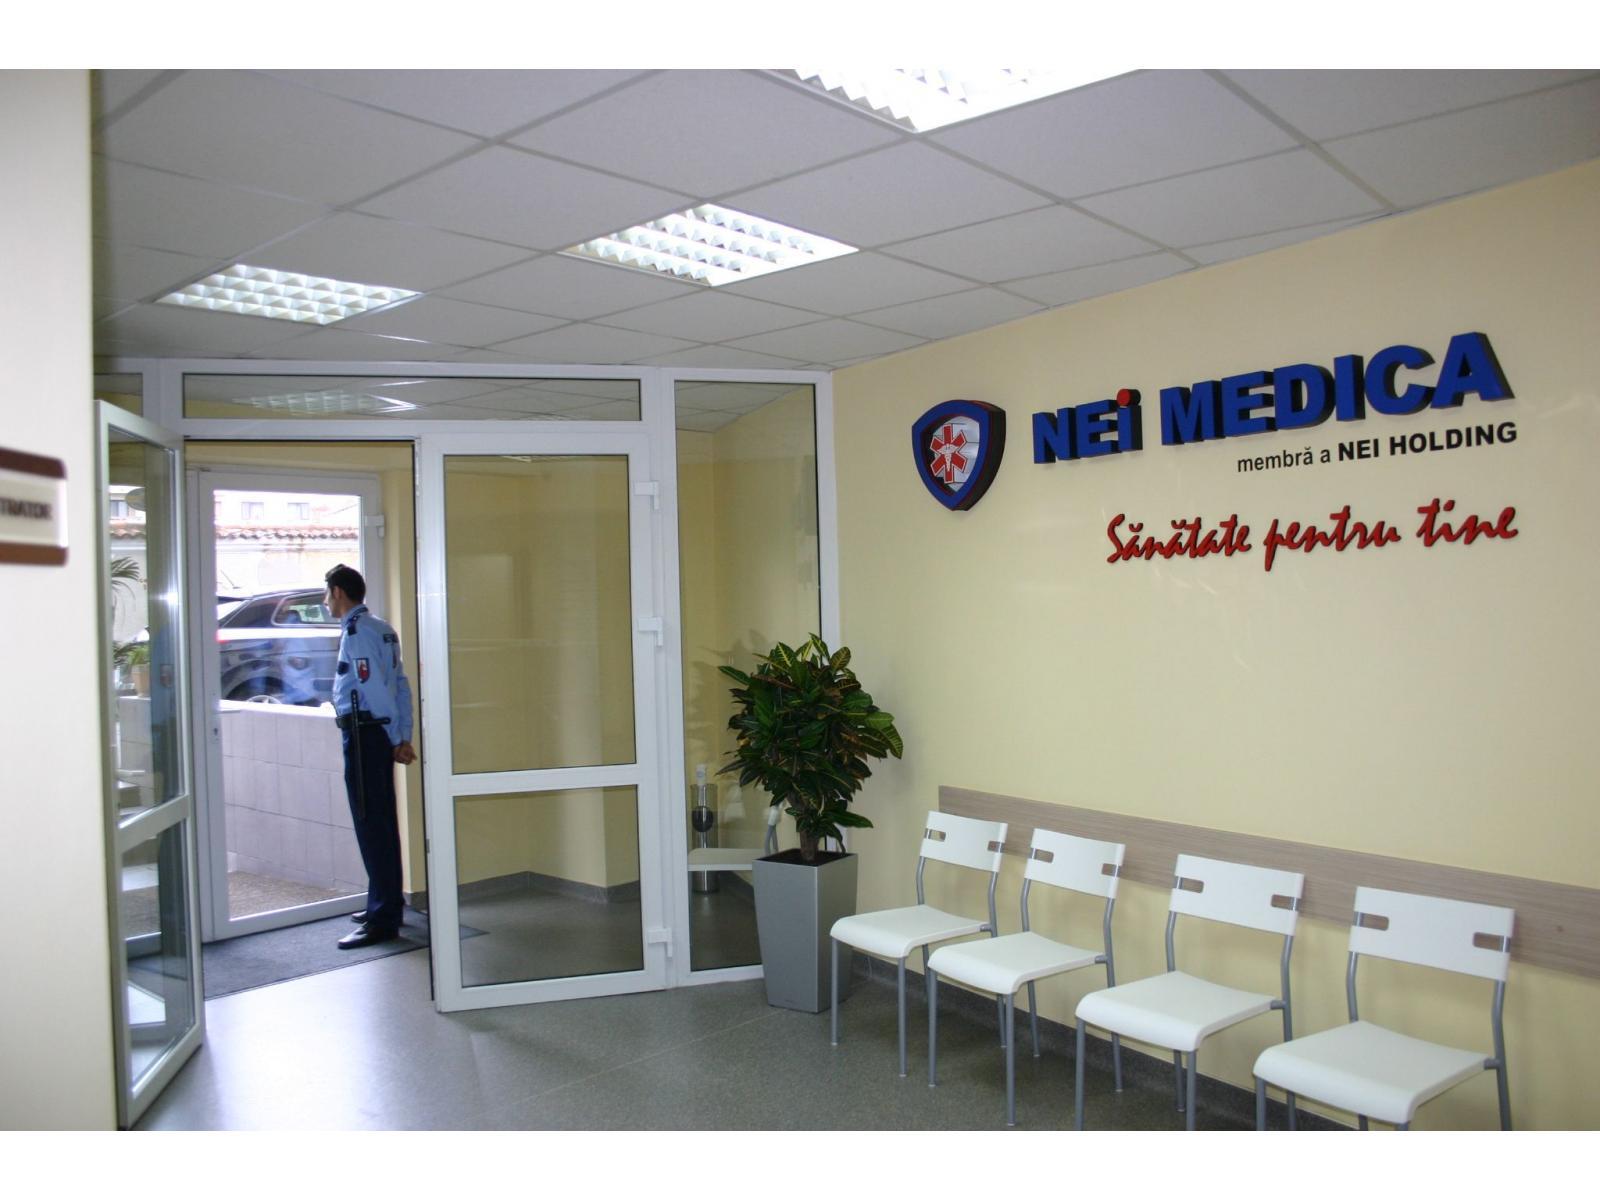 NEI Medica Asist - IMG_4898.JPG